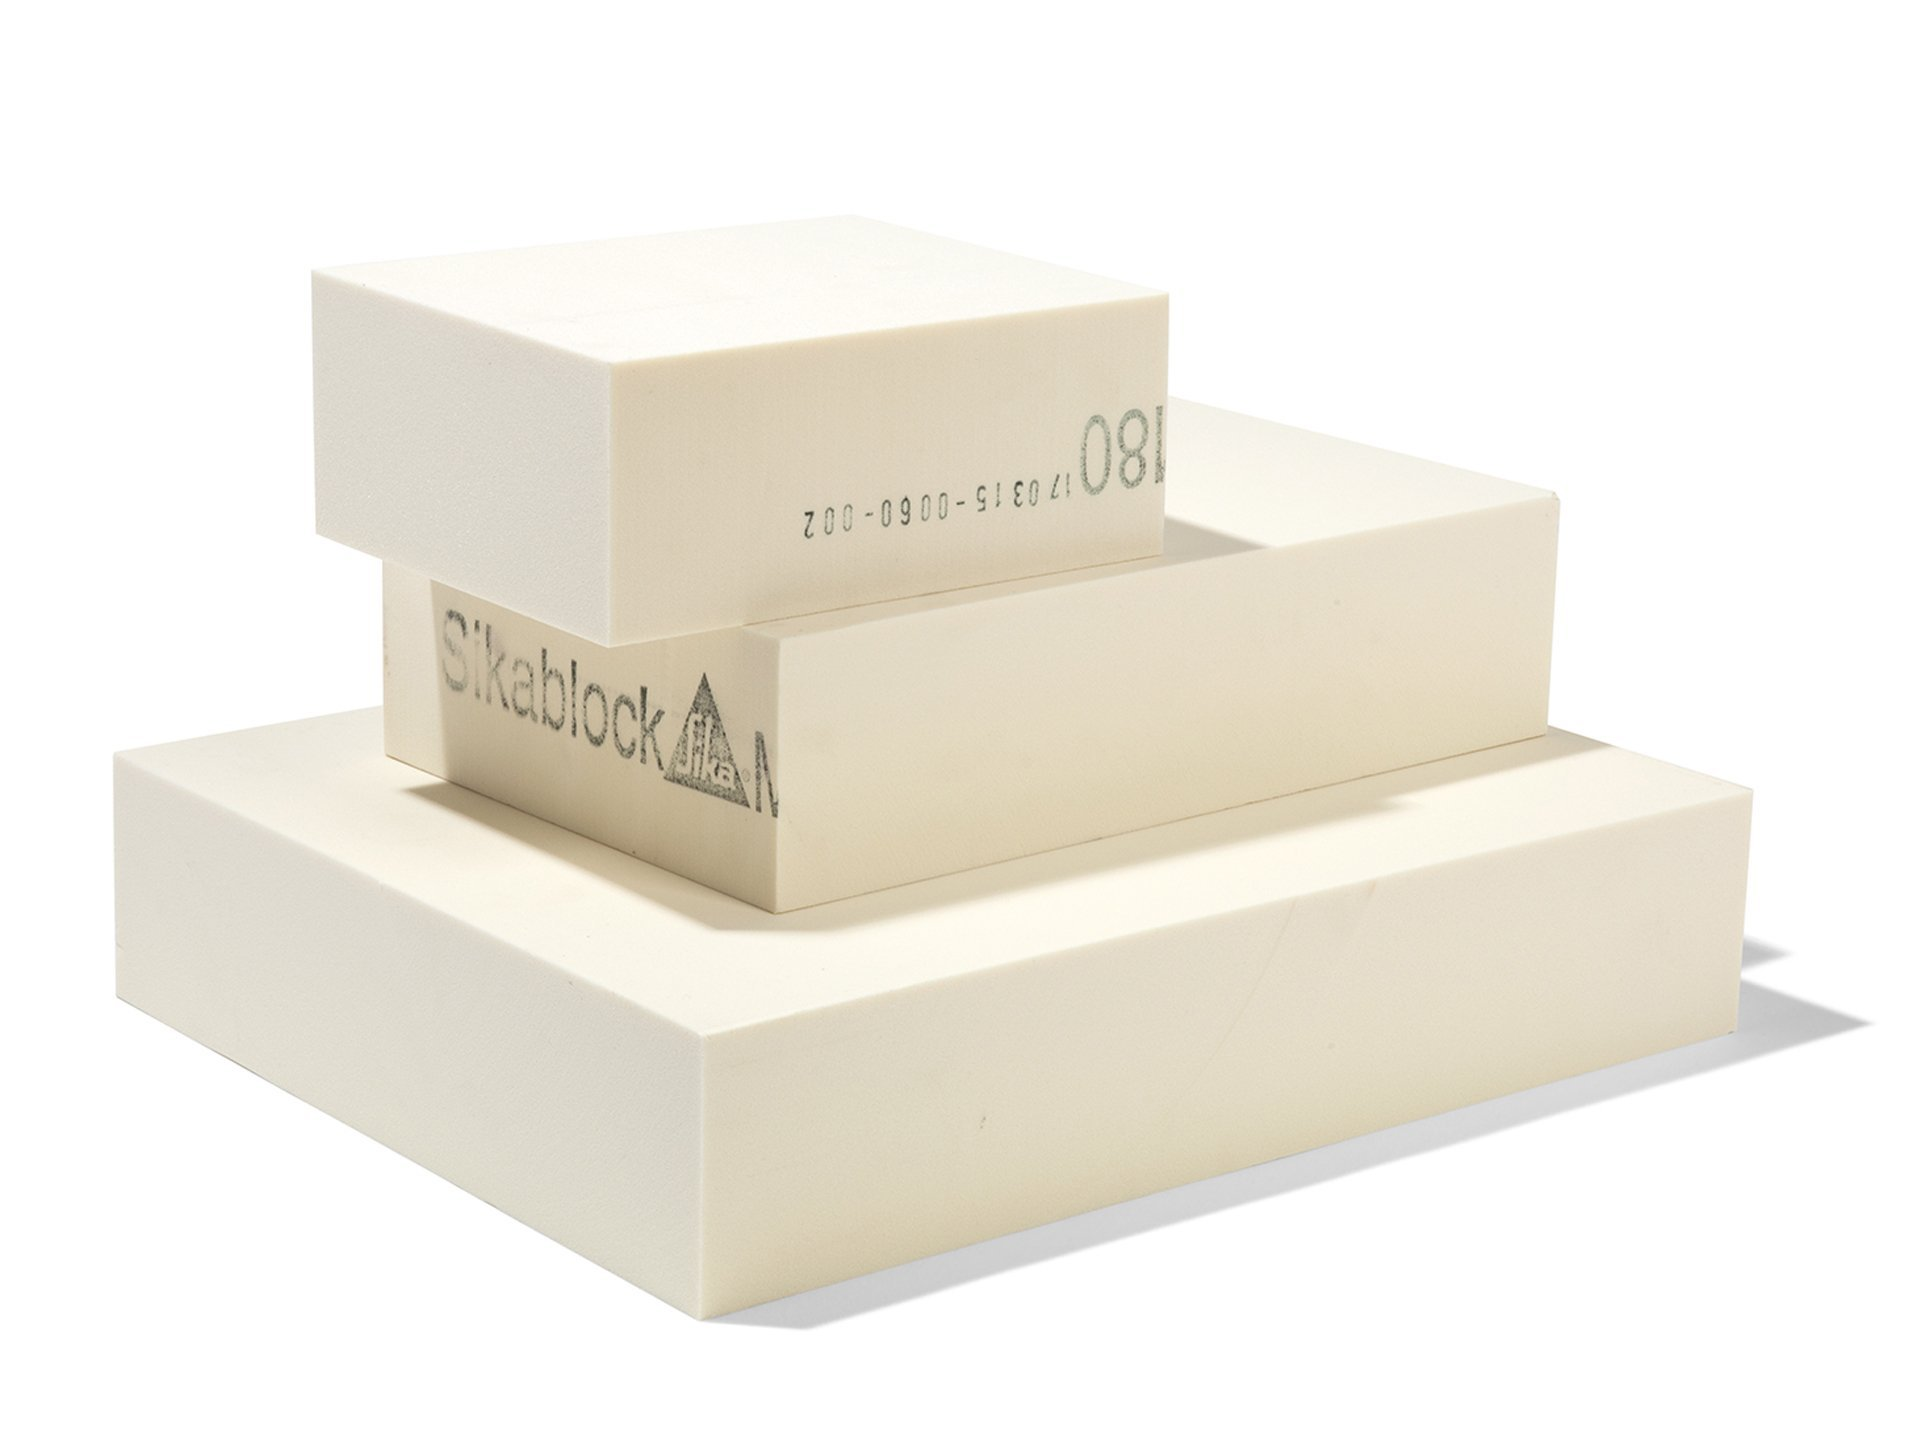 Buy Styrofoam, light blue, untrimmed online at Modulor